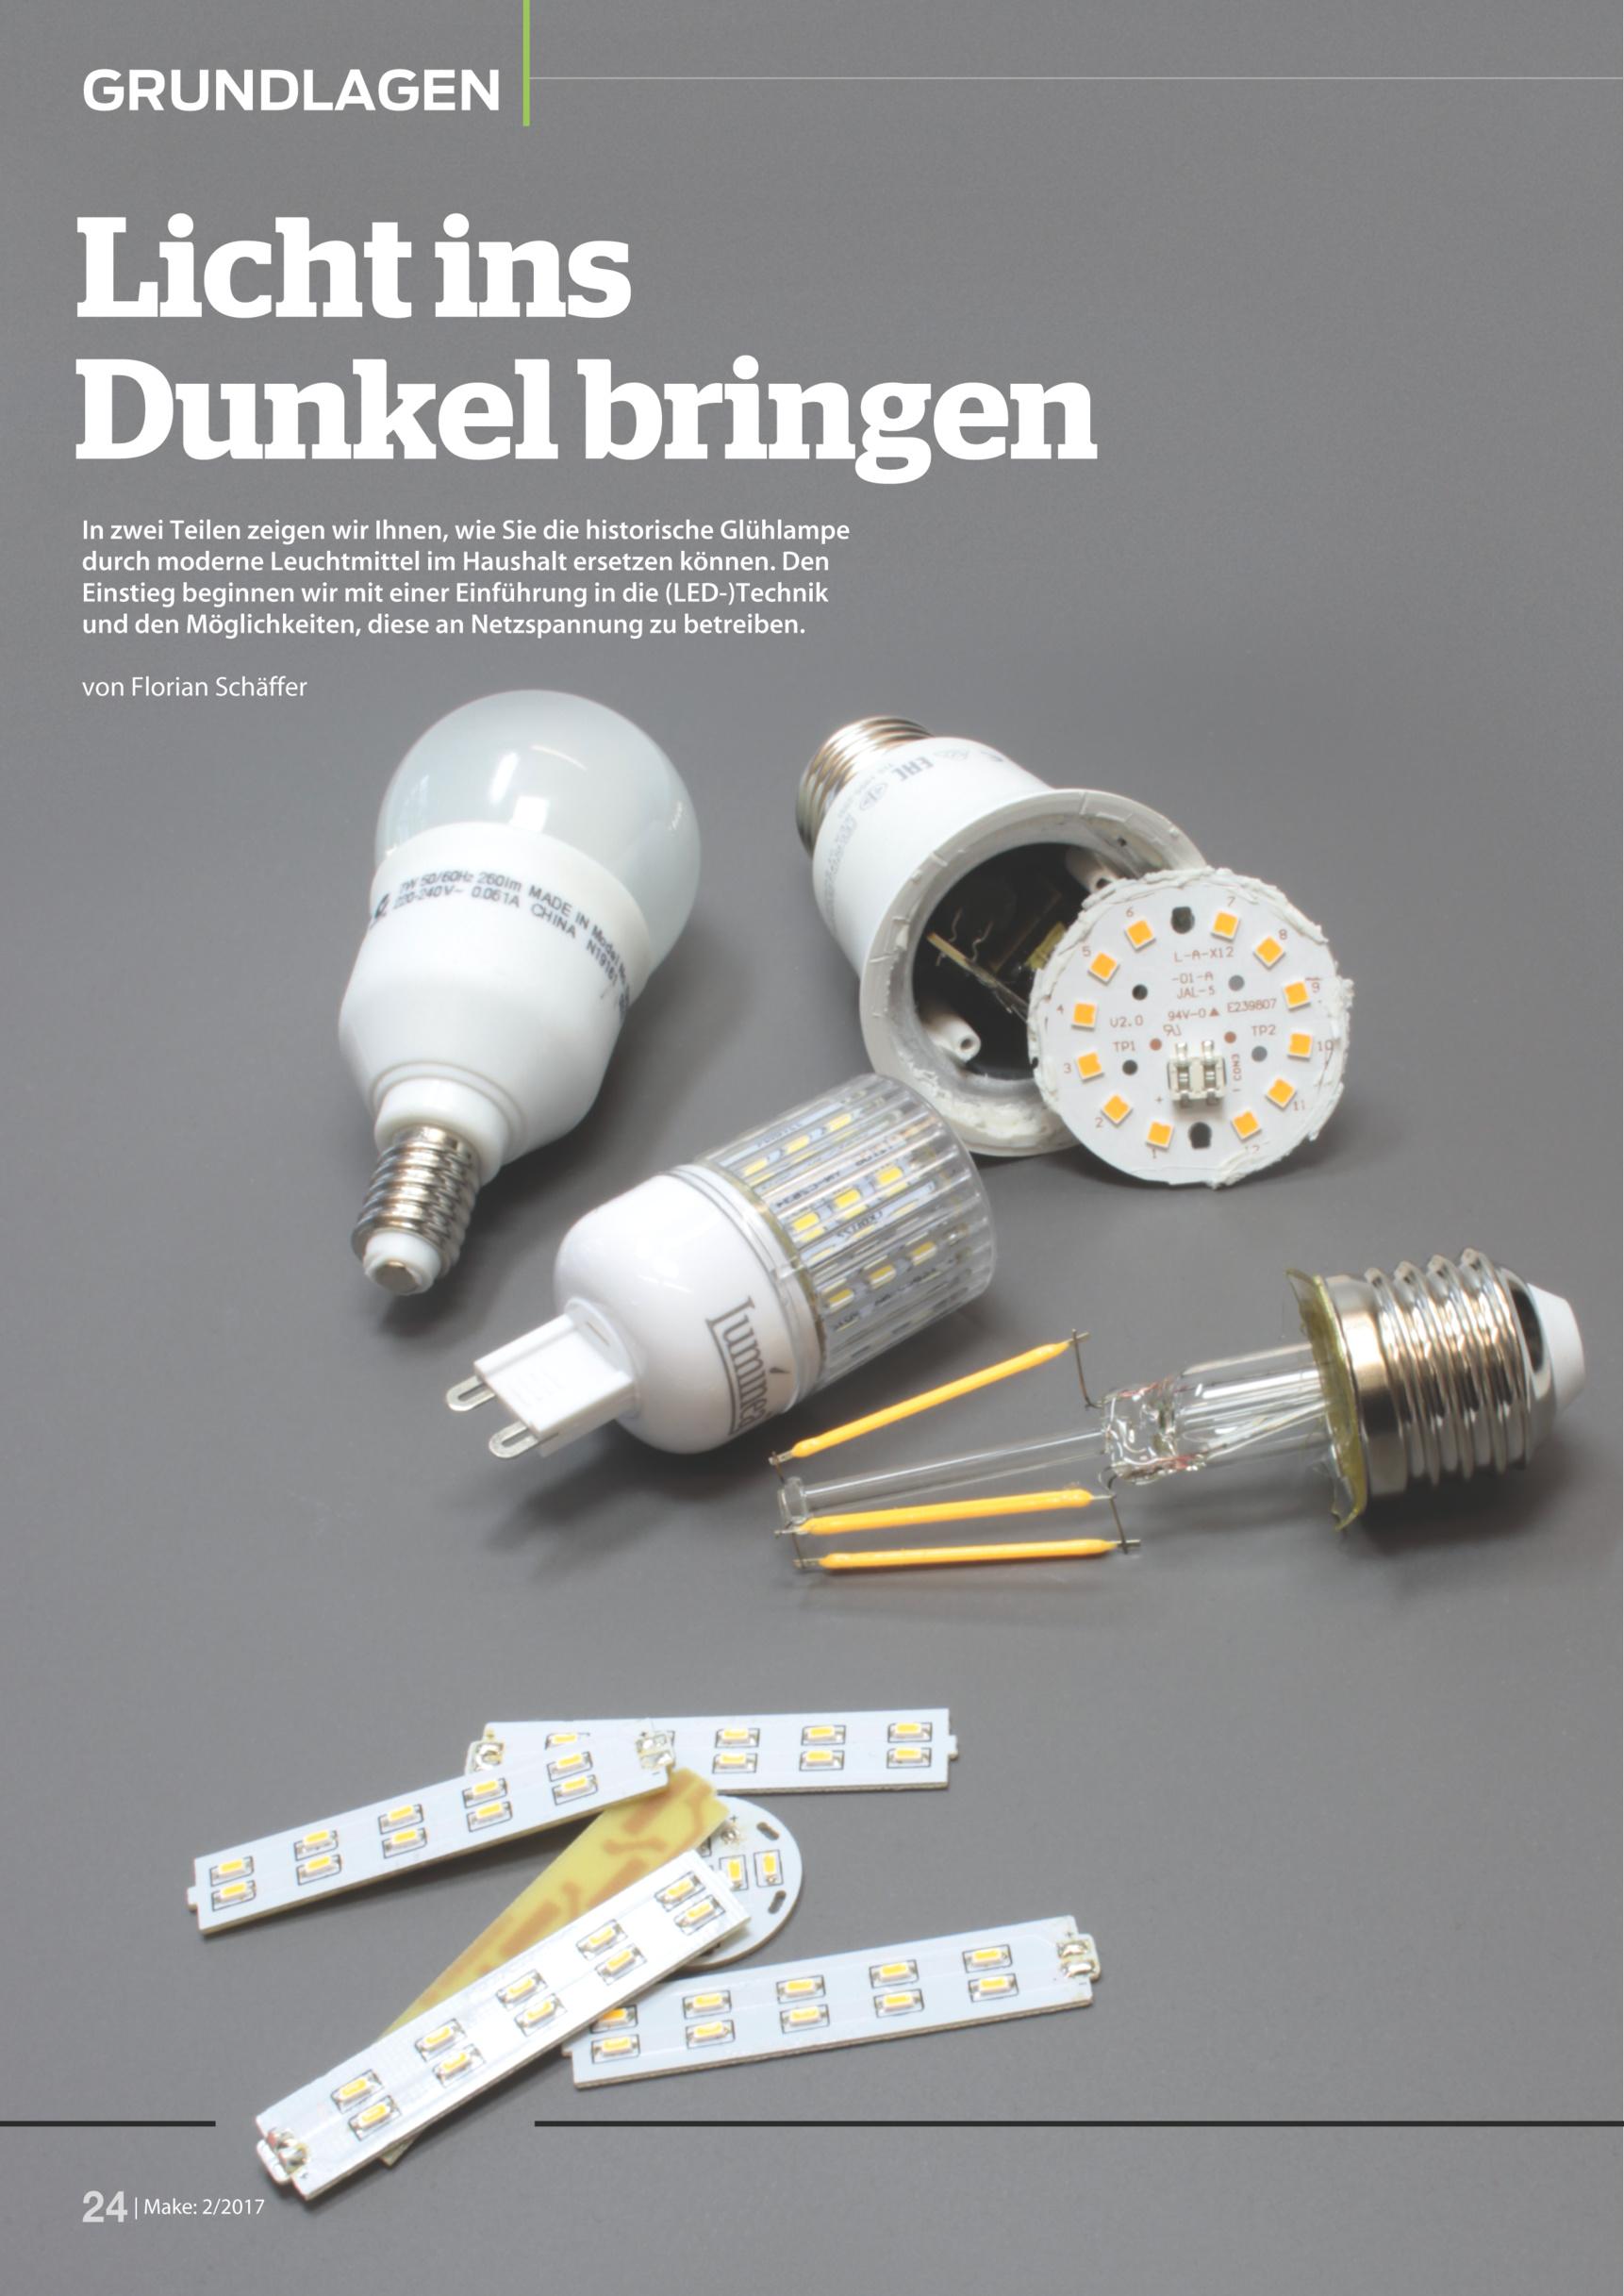 Neues Leben für alte Computermonitore | Make Magazin | Heise Select